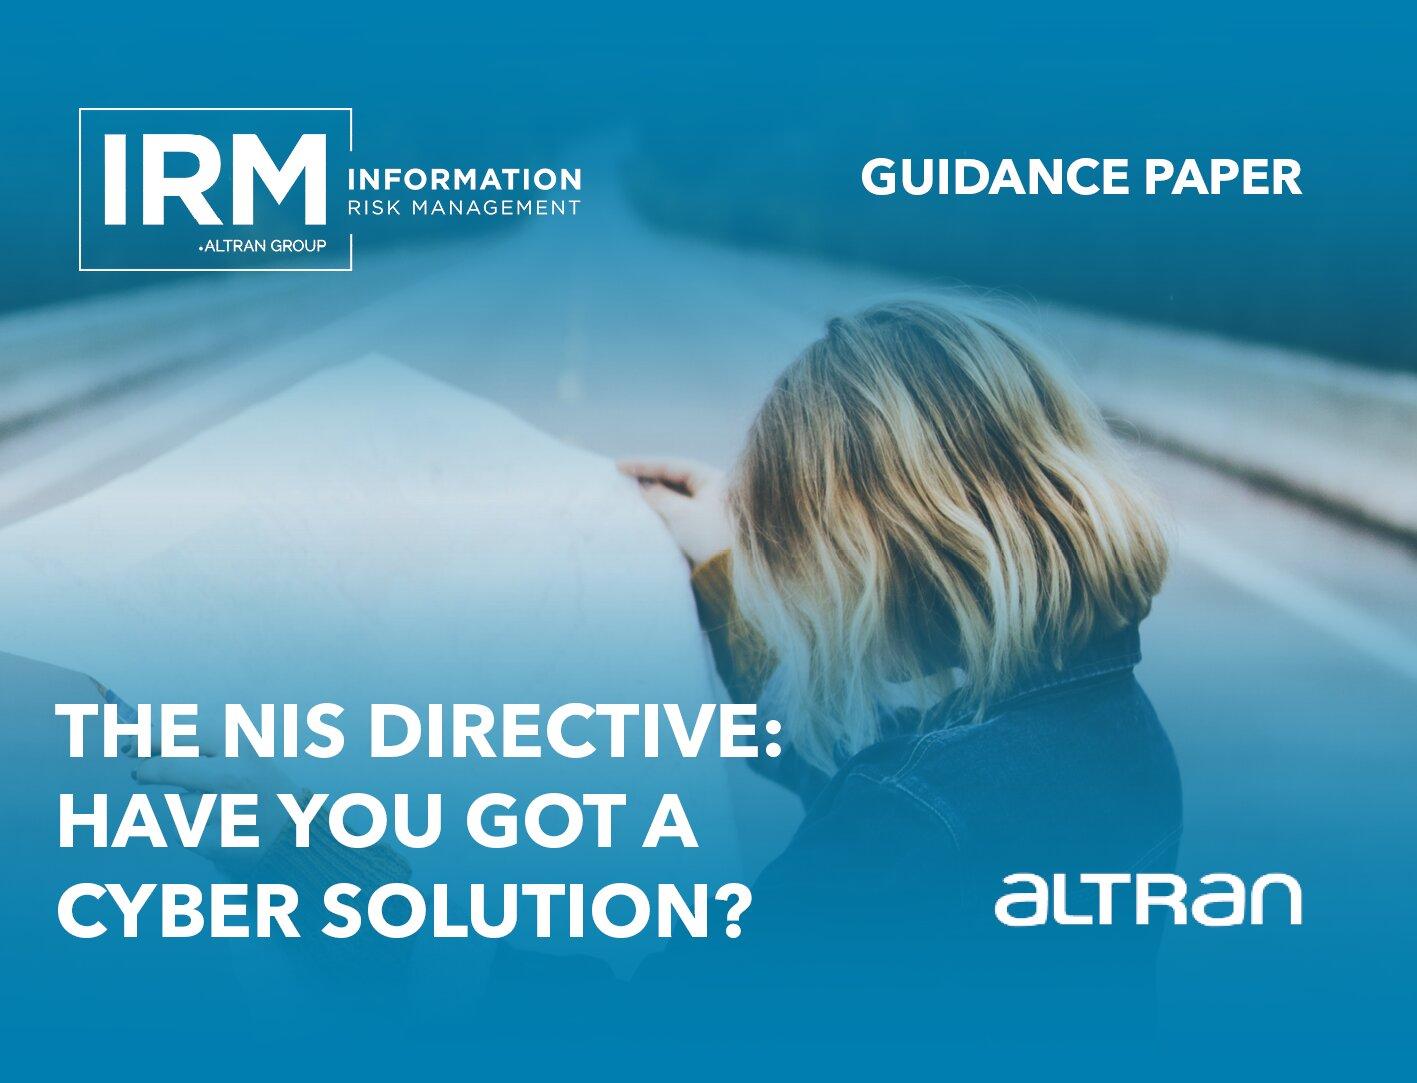 NISD_Guidance_Paper_Miniture_Website